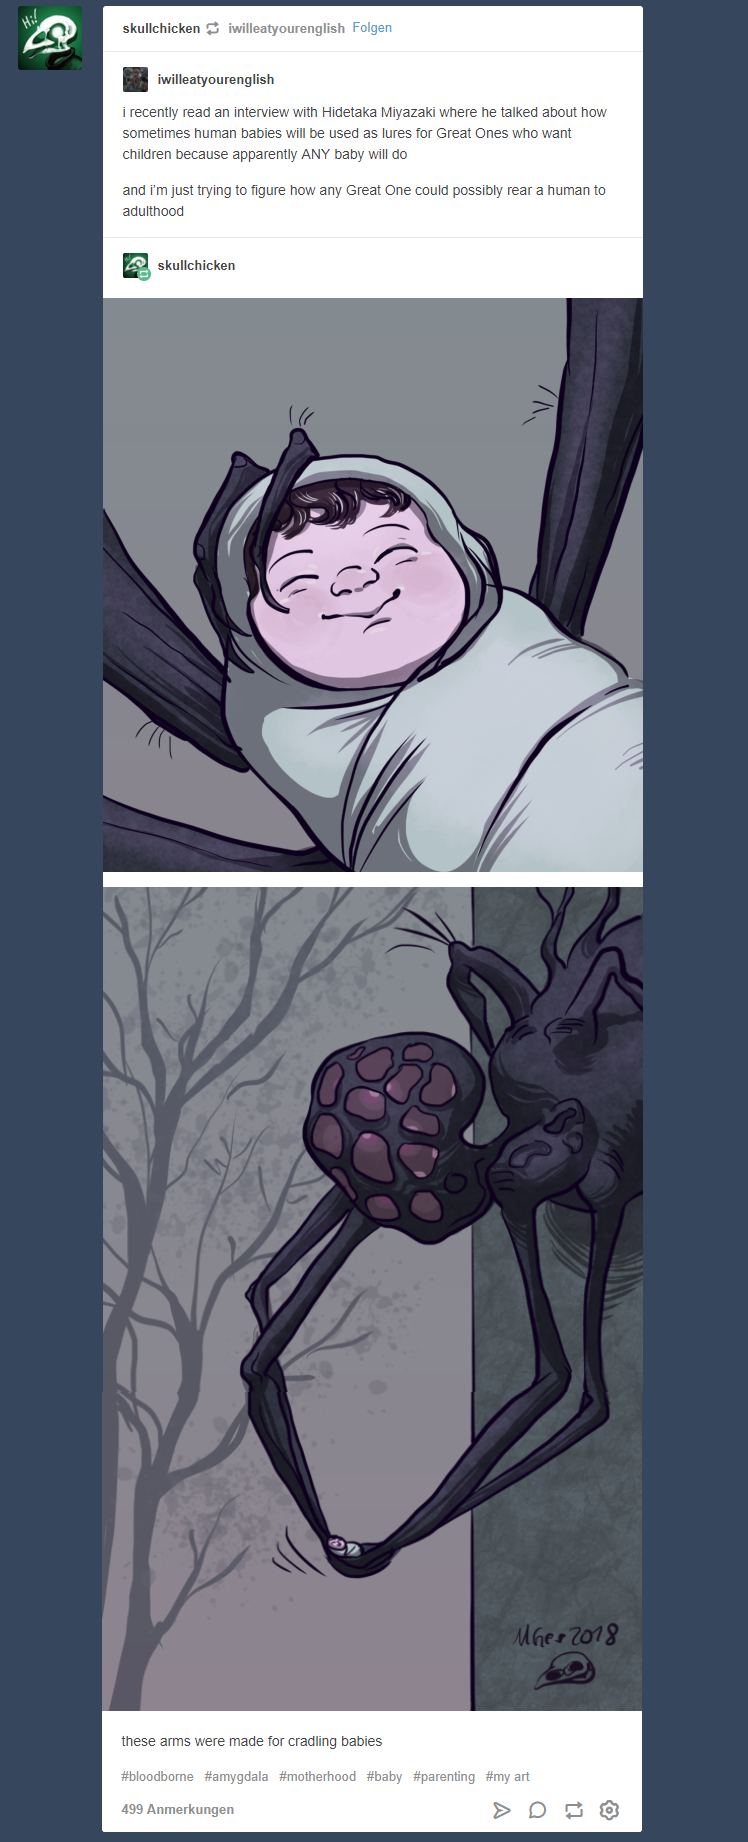 Amygdala Mama Comic By Skullchicken Maike Gerstenkorn Bloodborne